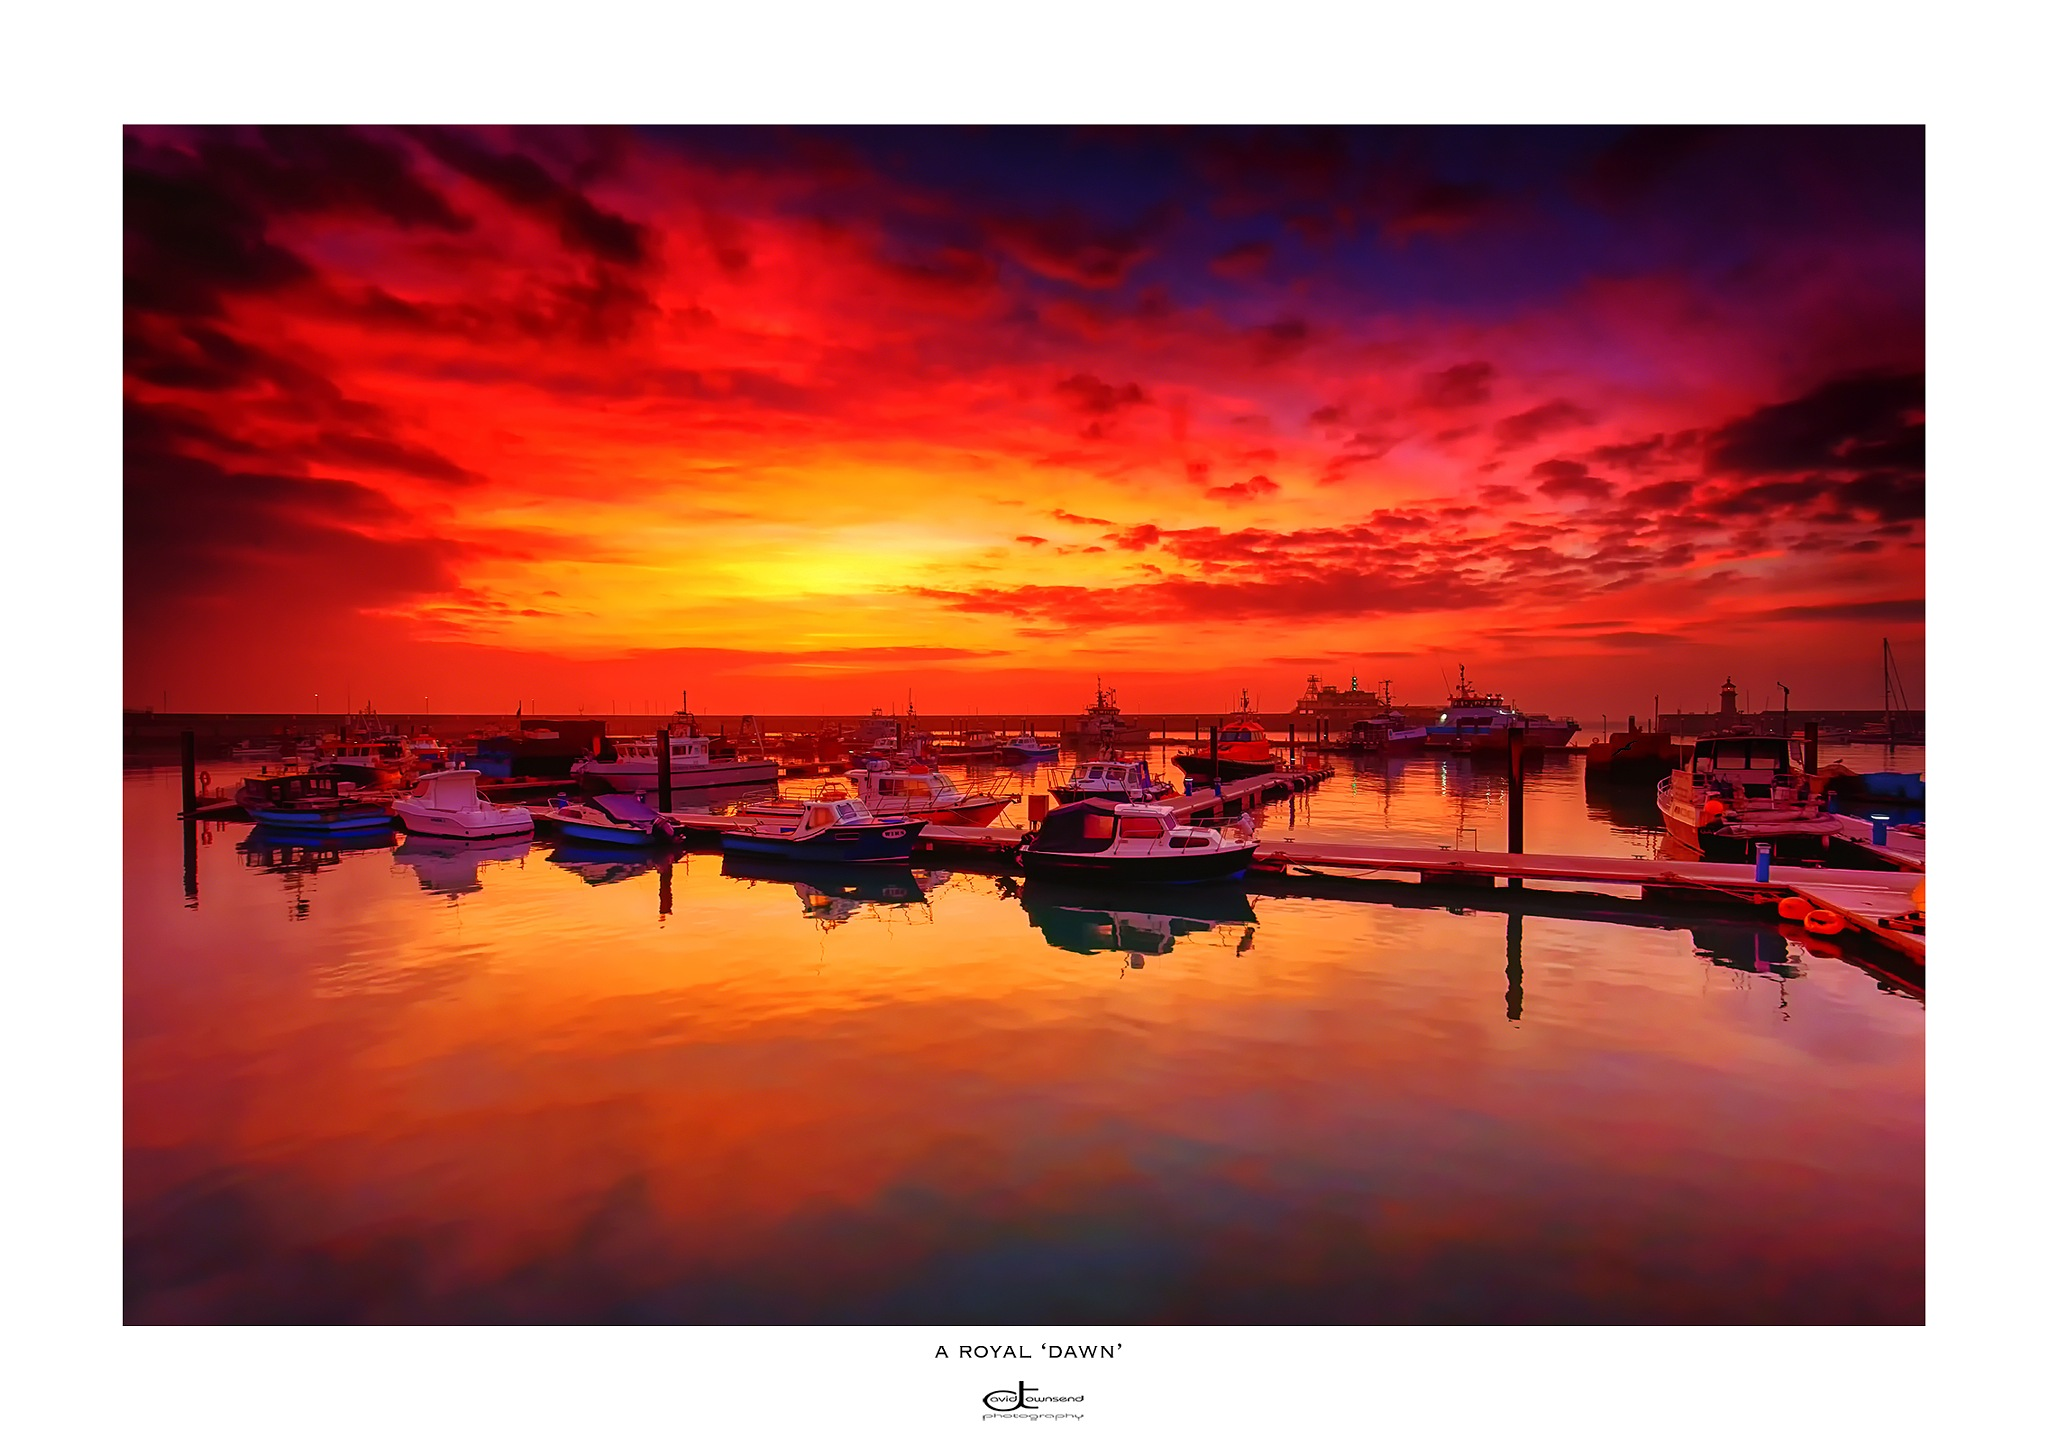 A Royal 'Dawn' by David Townsend